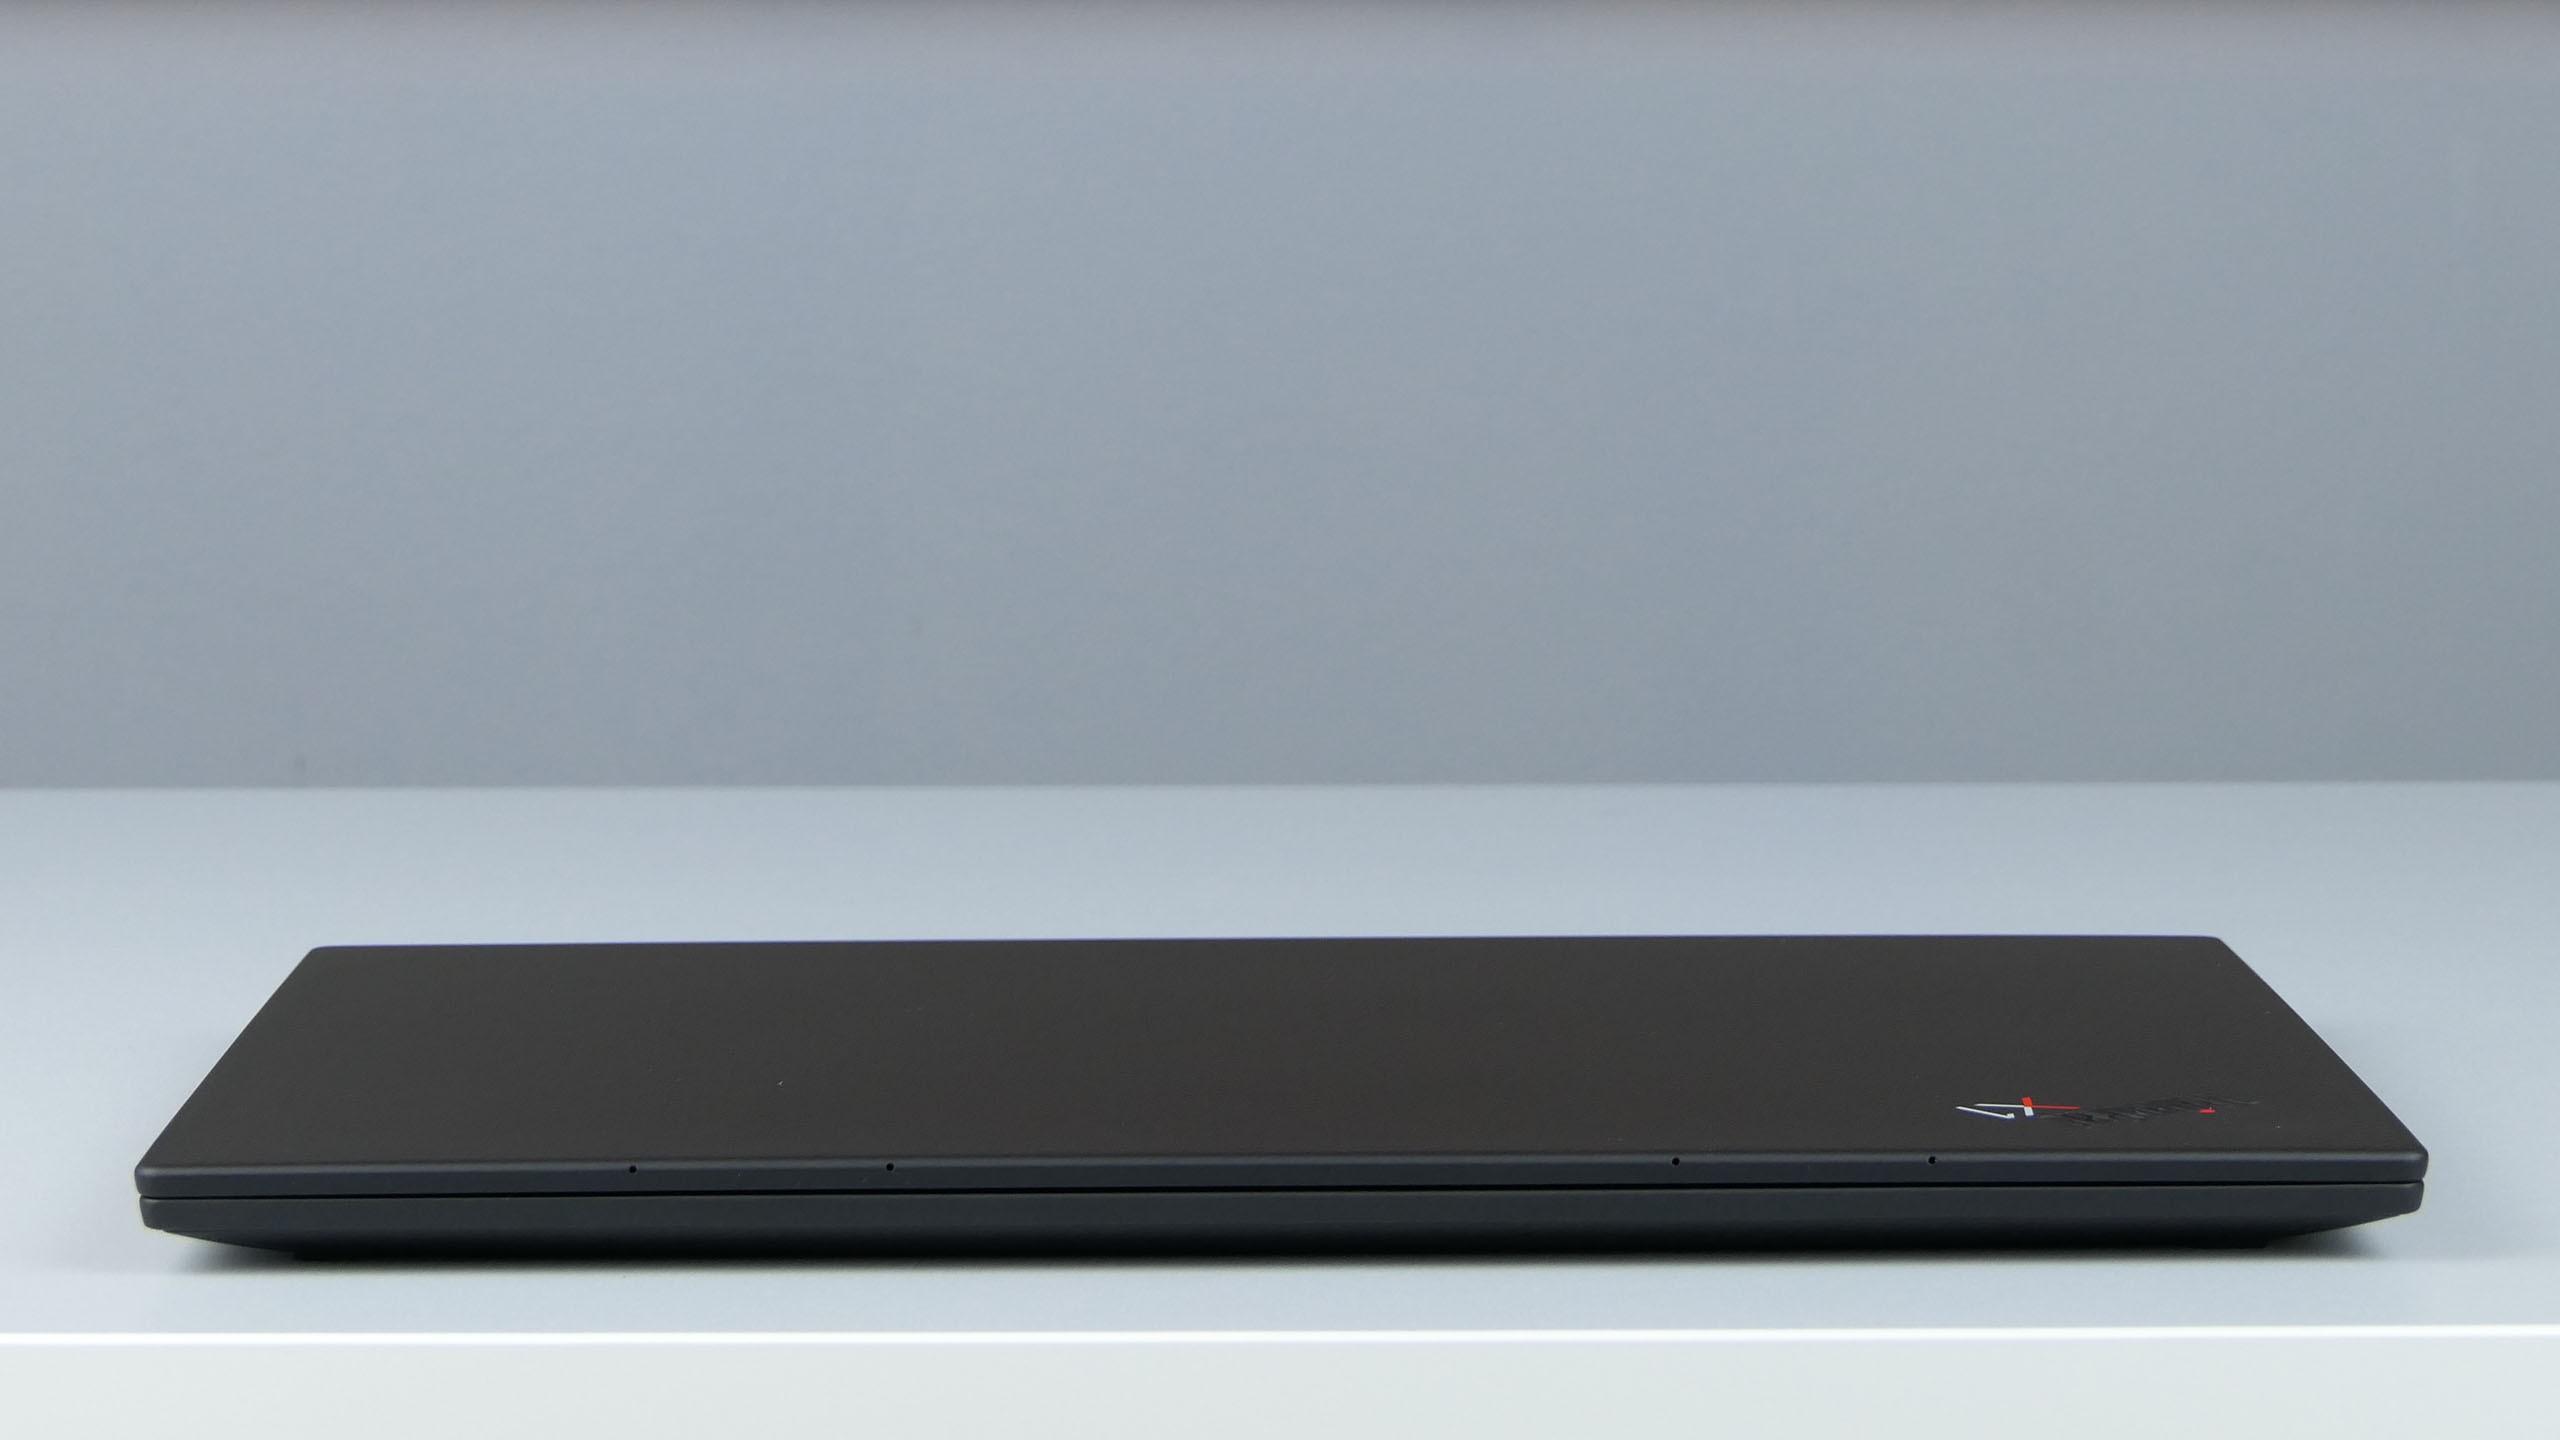 Lenovo ThinkPad X1 Carbon 8th Gen - front ultrabooka